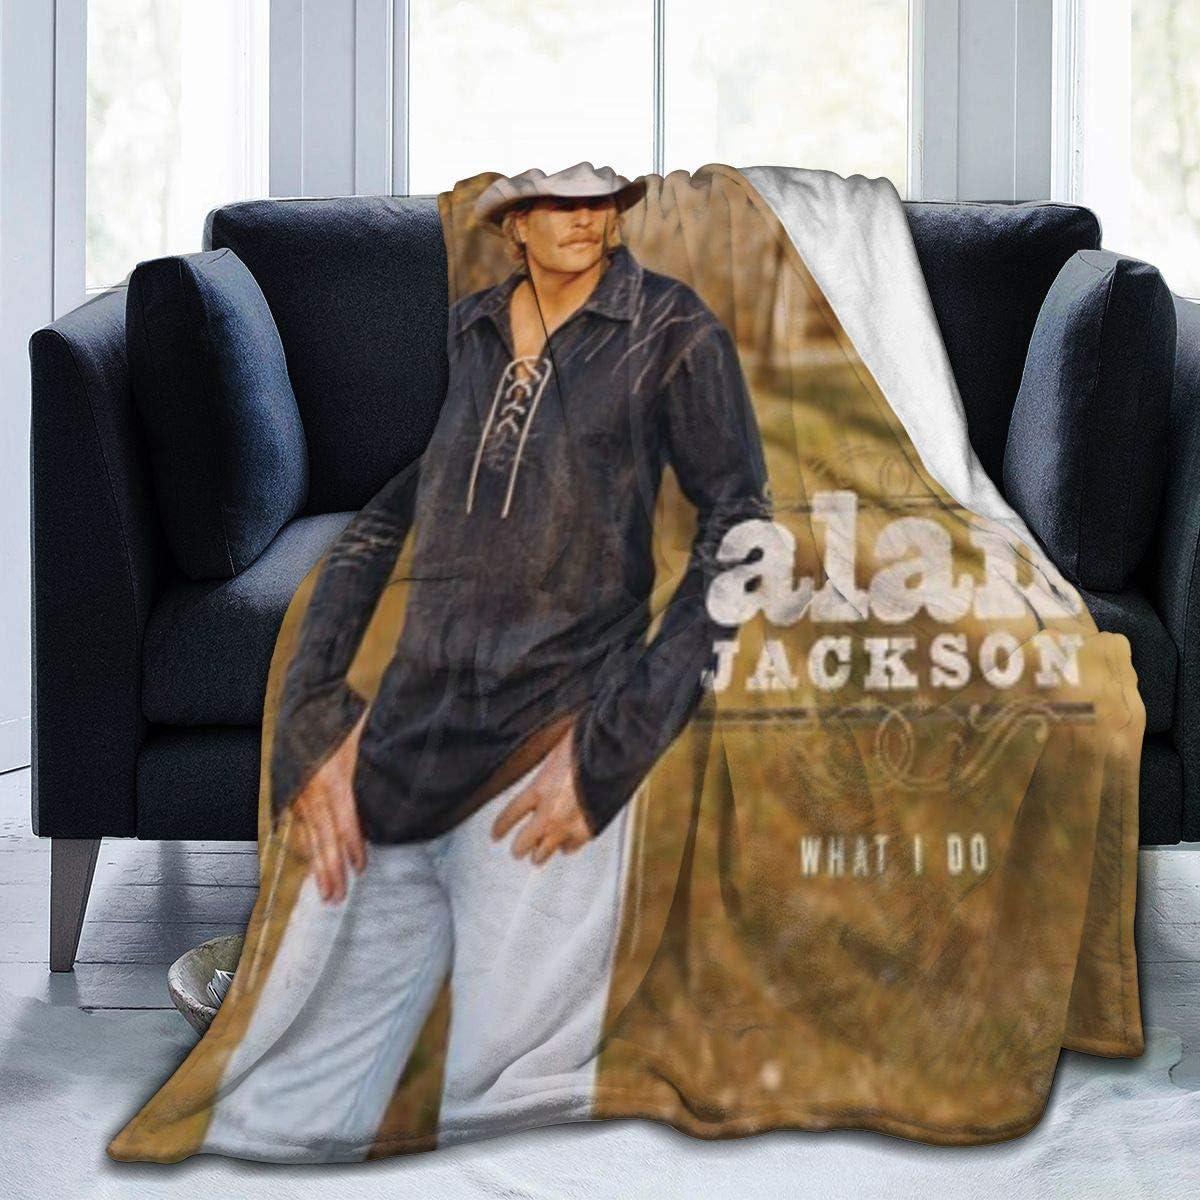 Ernest J Bates Alan Jackson Luxury セール特別価格 Soft Blan 別倉庫からの配送 Flannel Blanket Bed